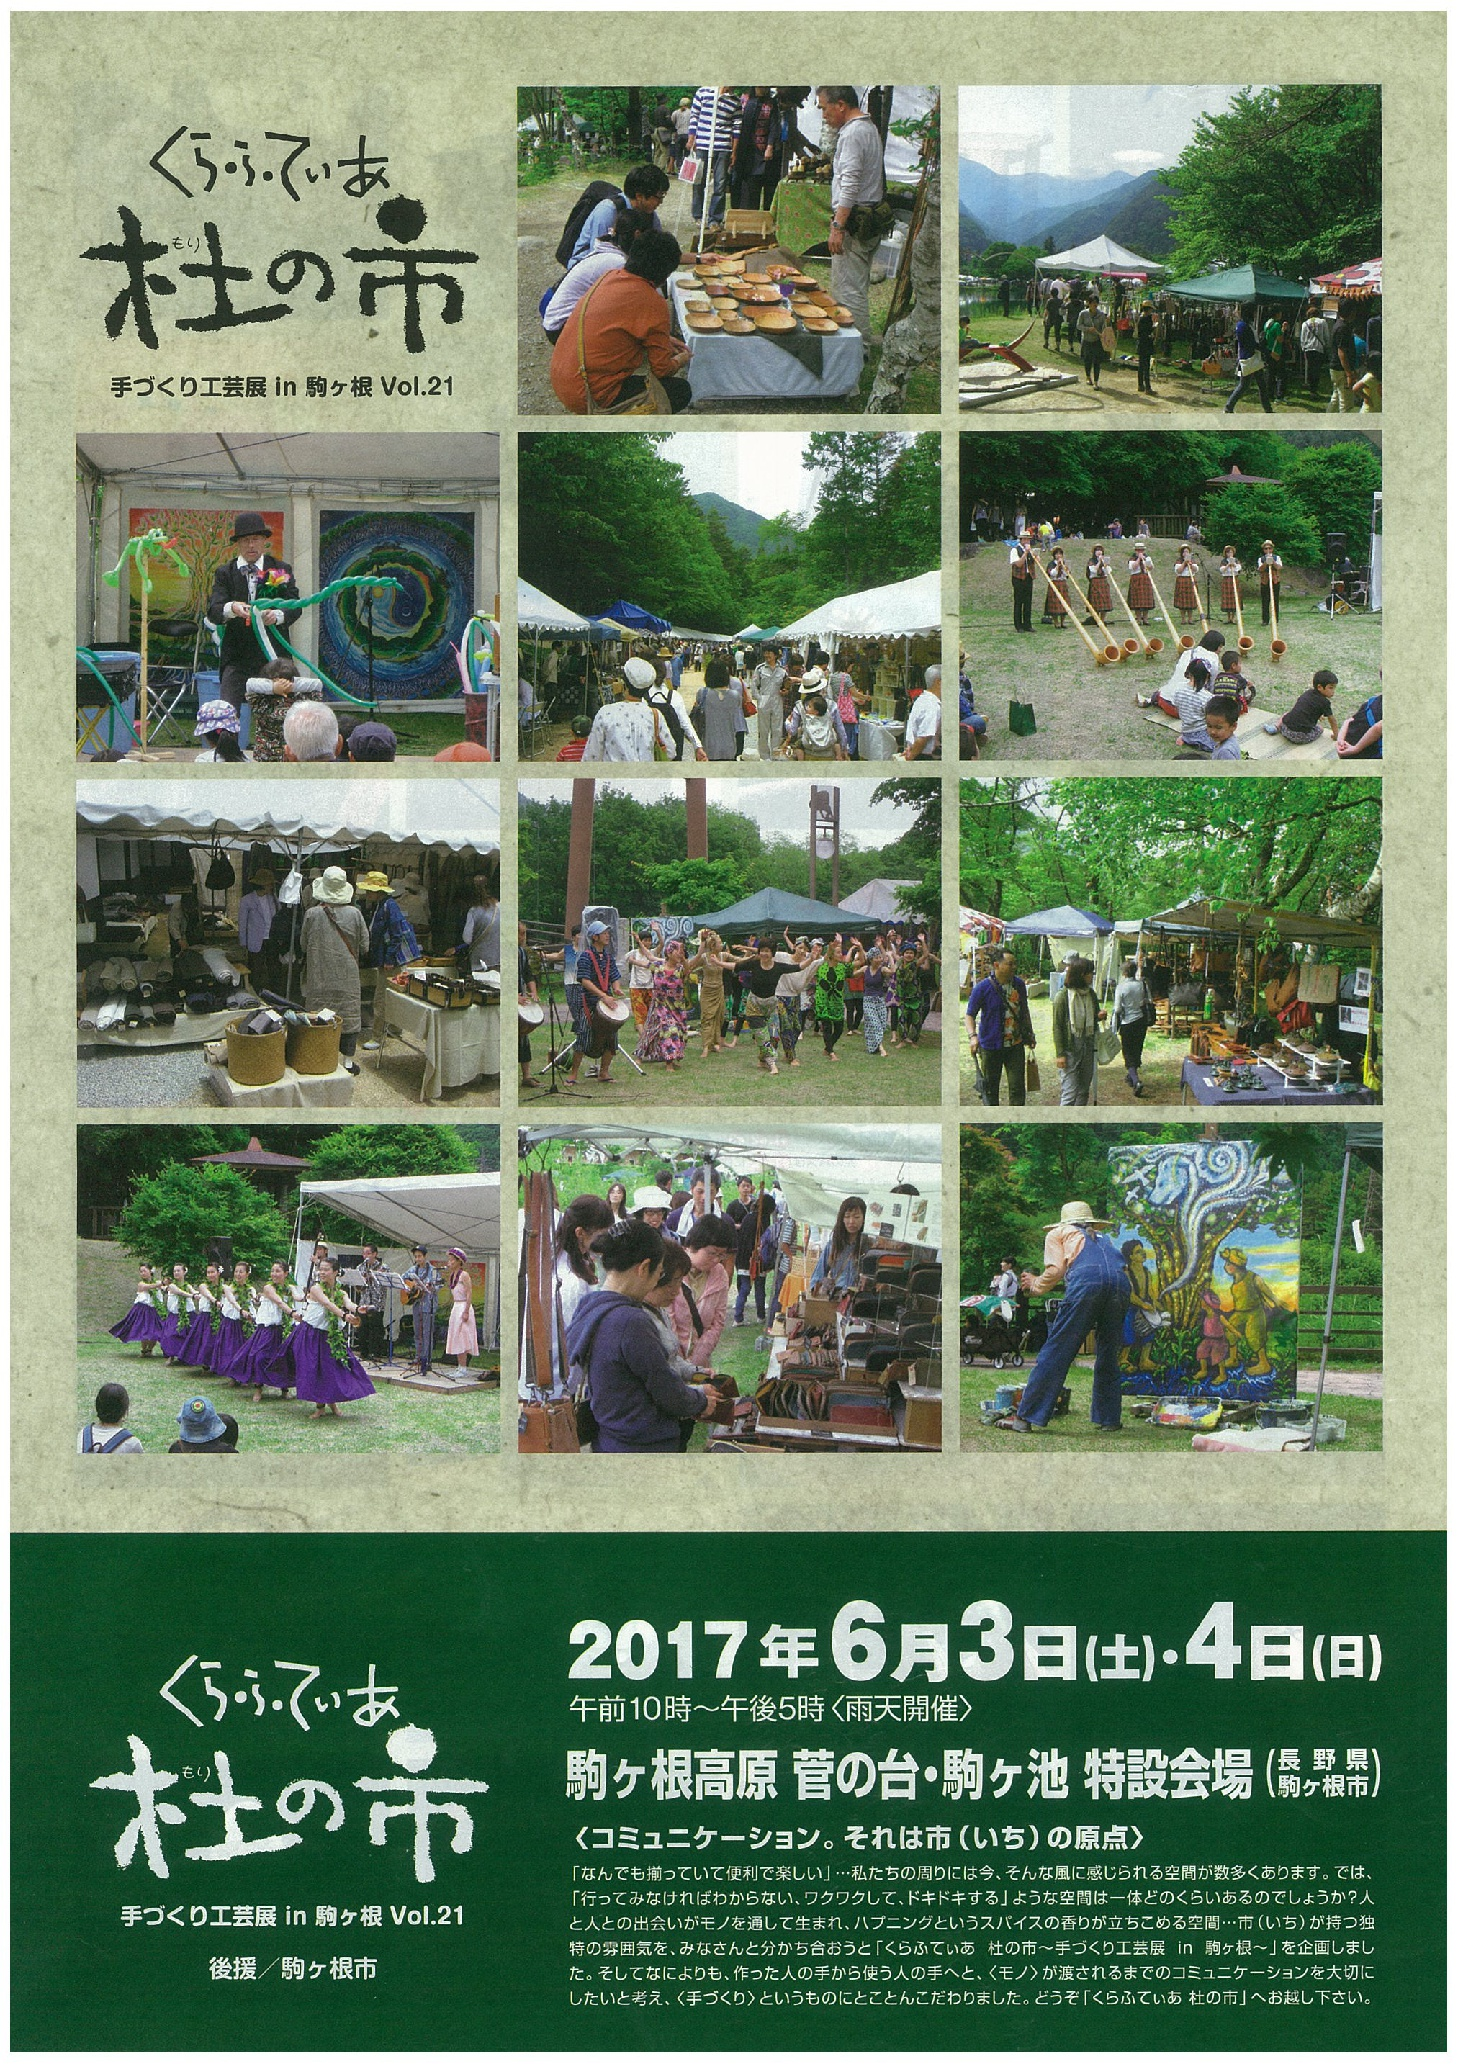 http://www.komagane-linx.co.jp/20170519122143-001%20%281%29.jpg